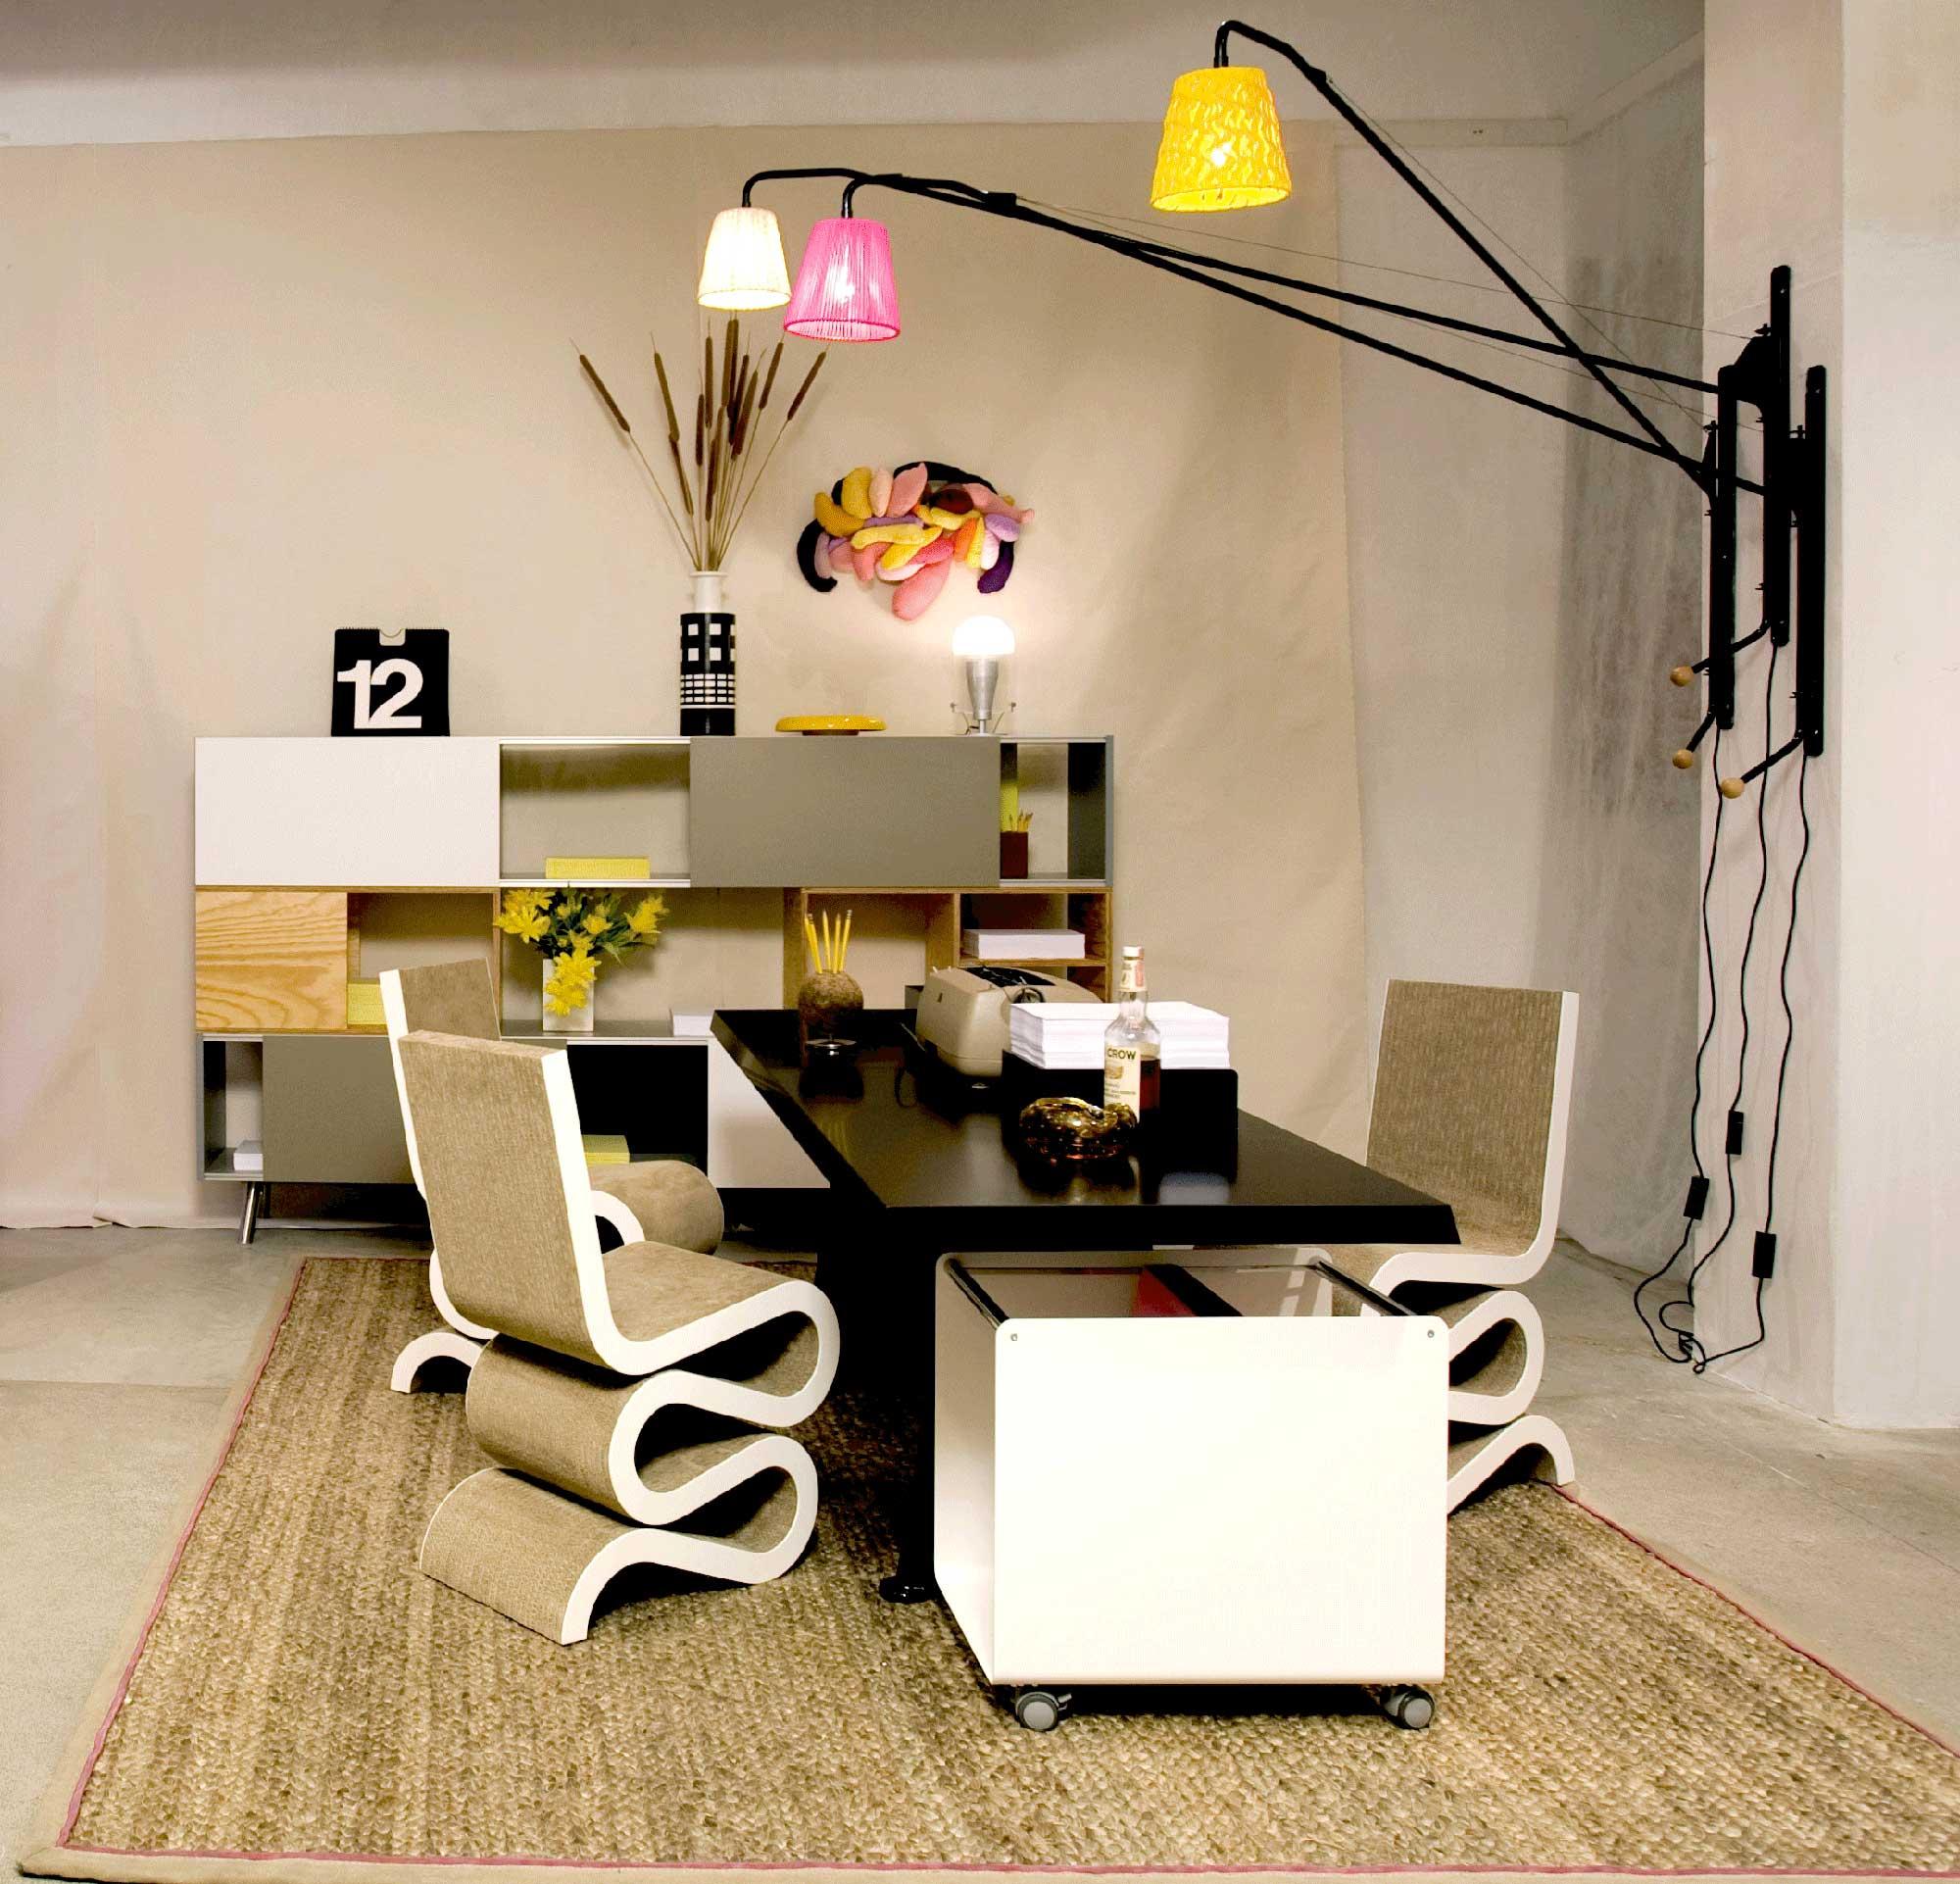 Home Office Interior Design Ideas: How To Get A Modern Home Office Interior Design